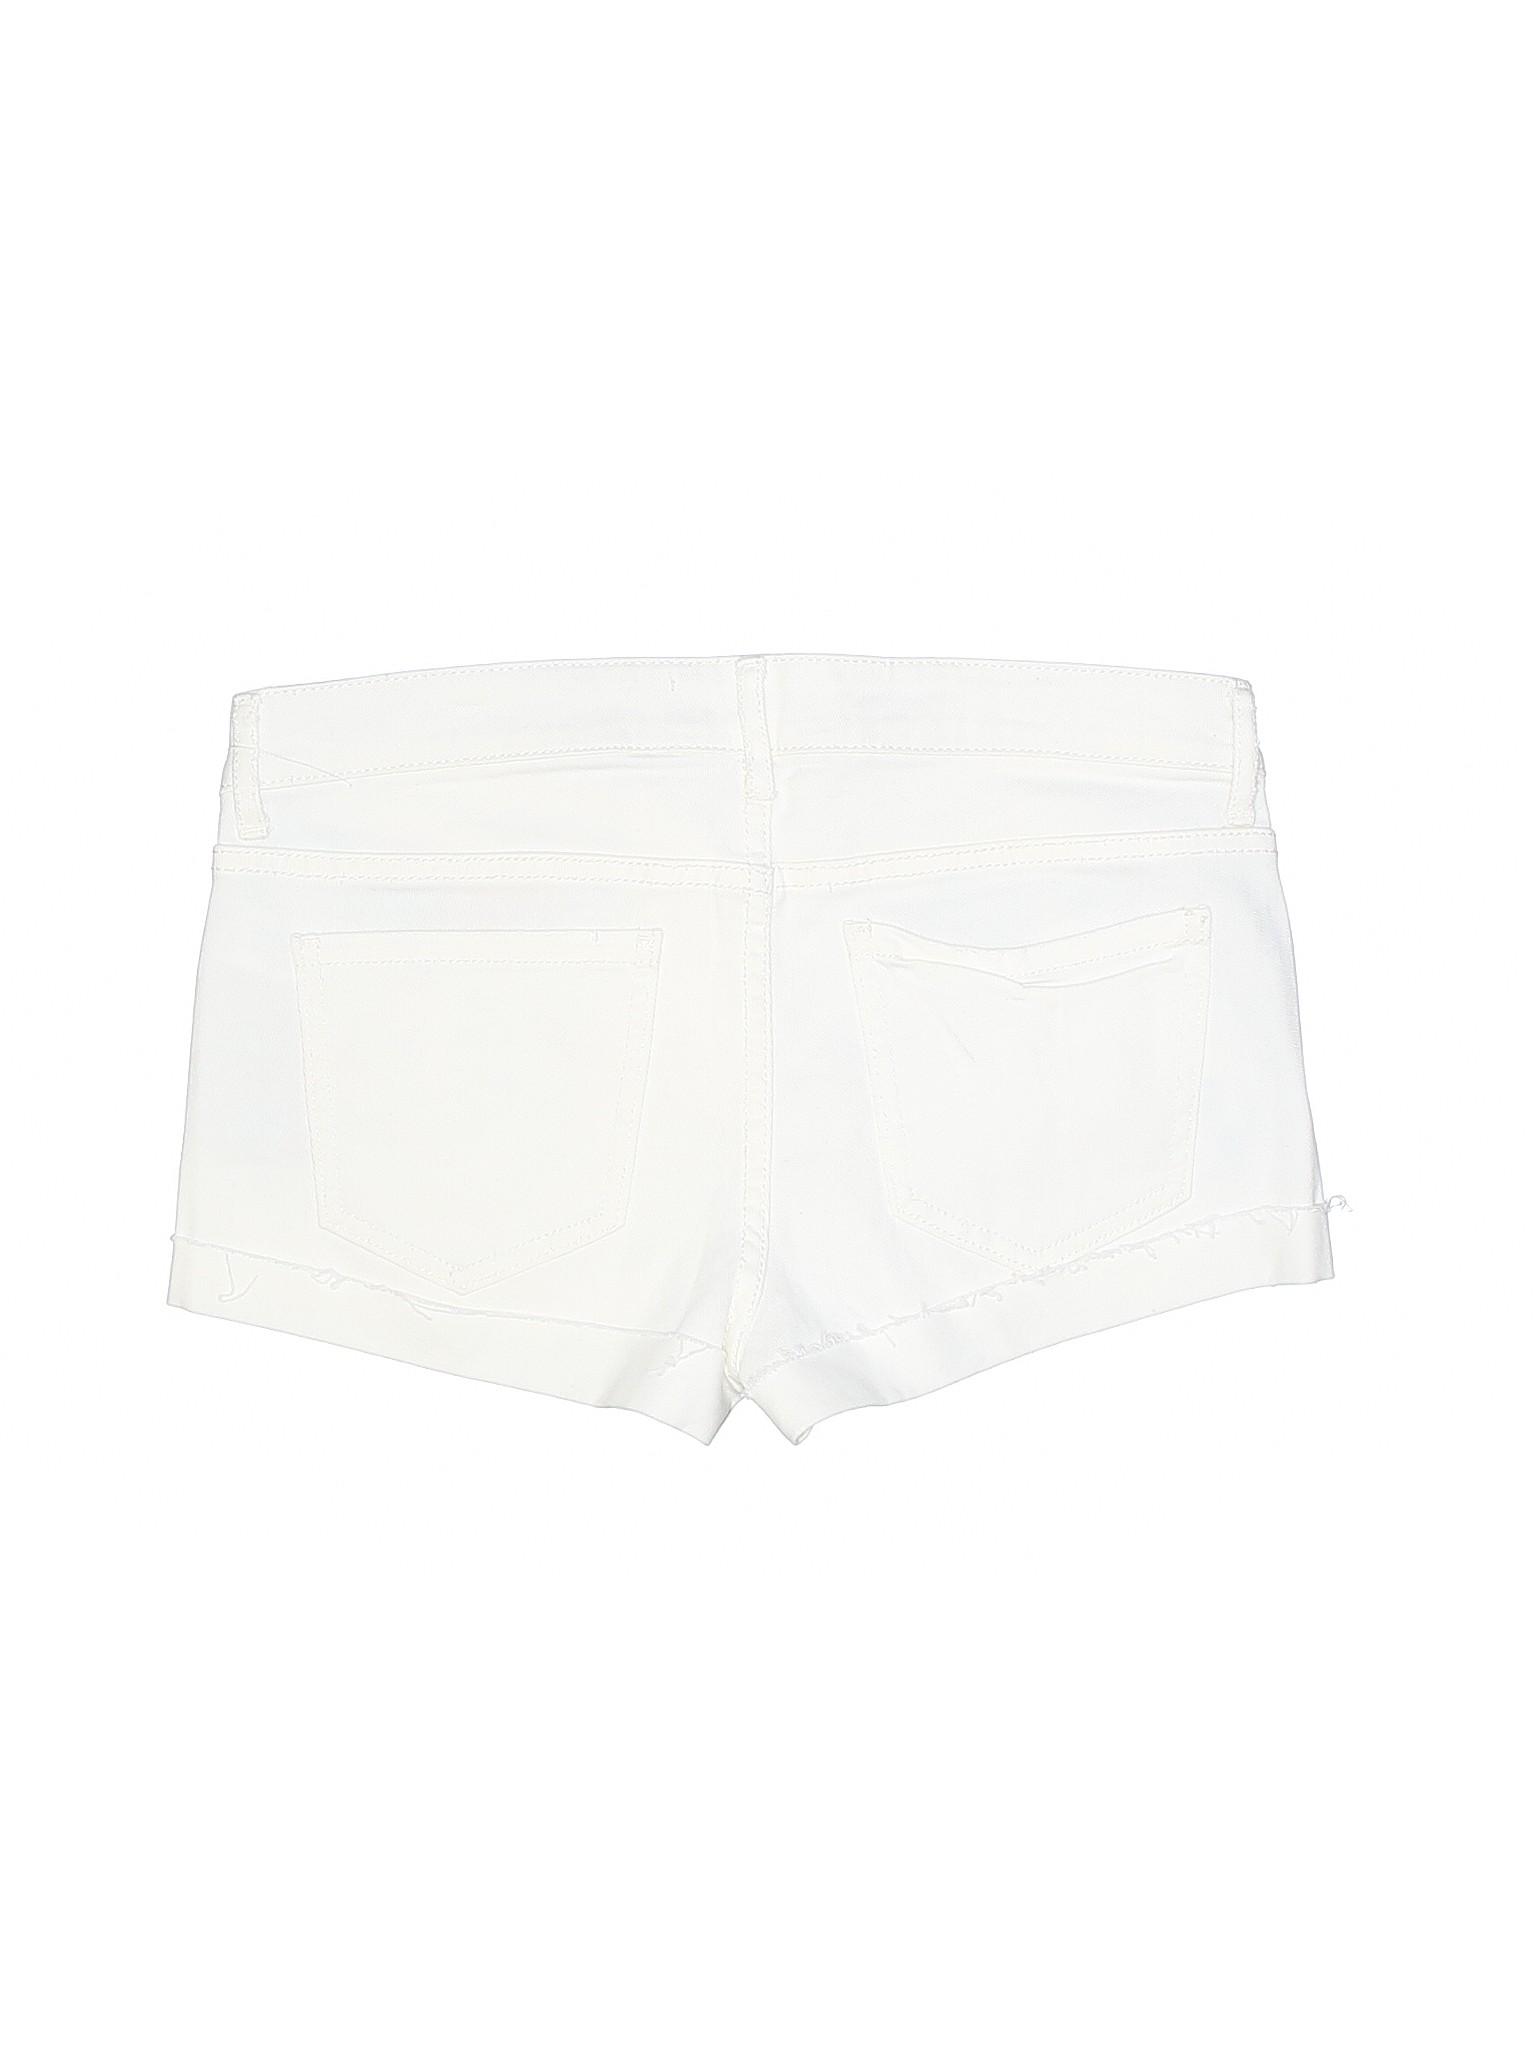 Denim Denim Boutique 21 21 Boutique Forever Shorts Forever UYwHpqSnH